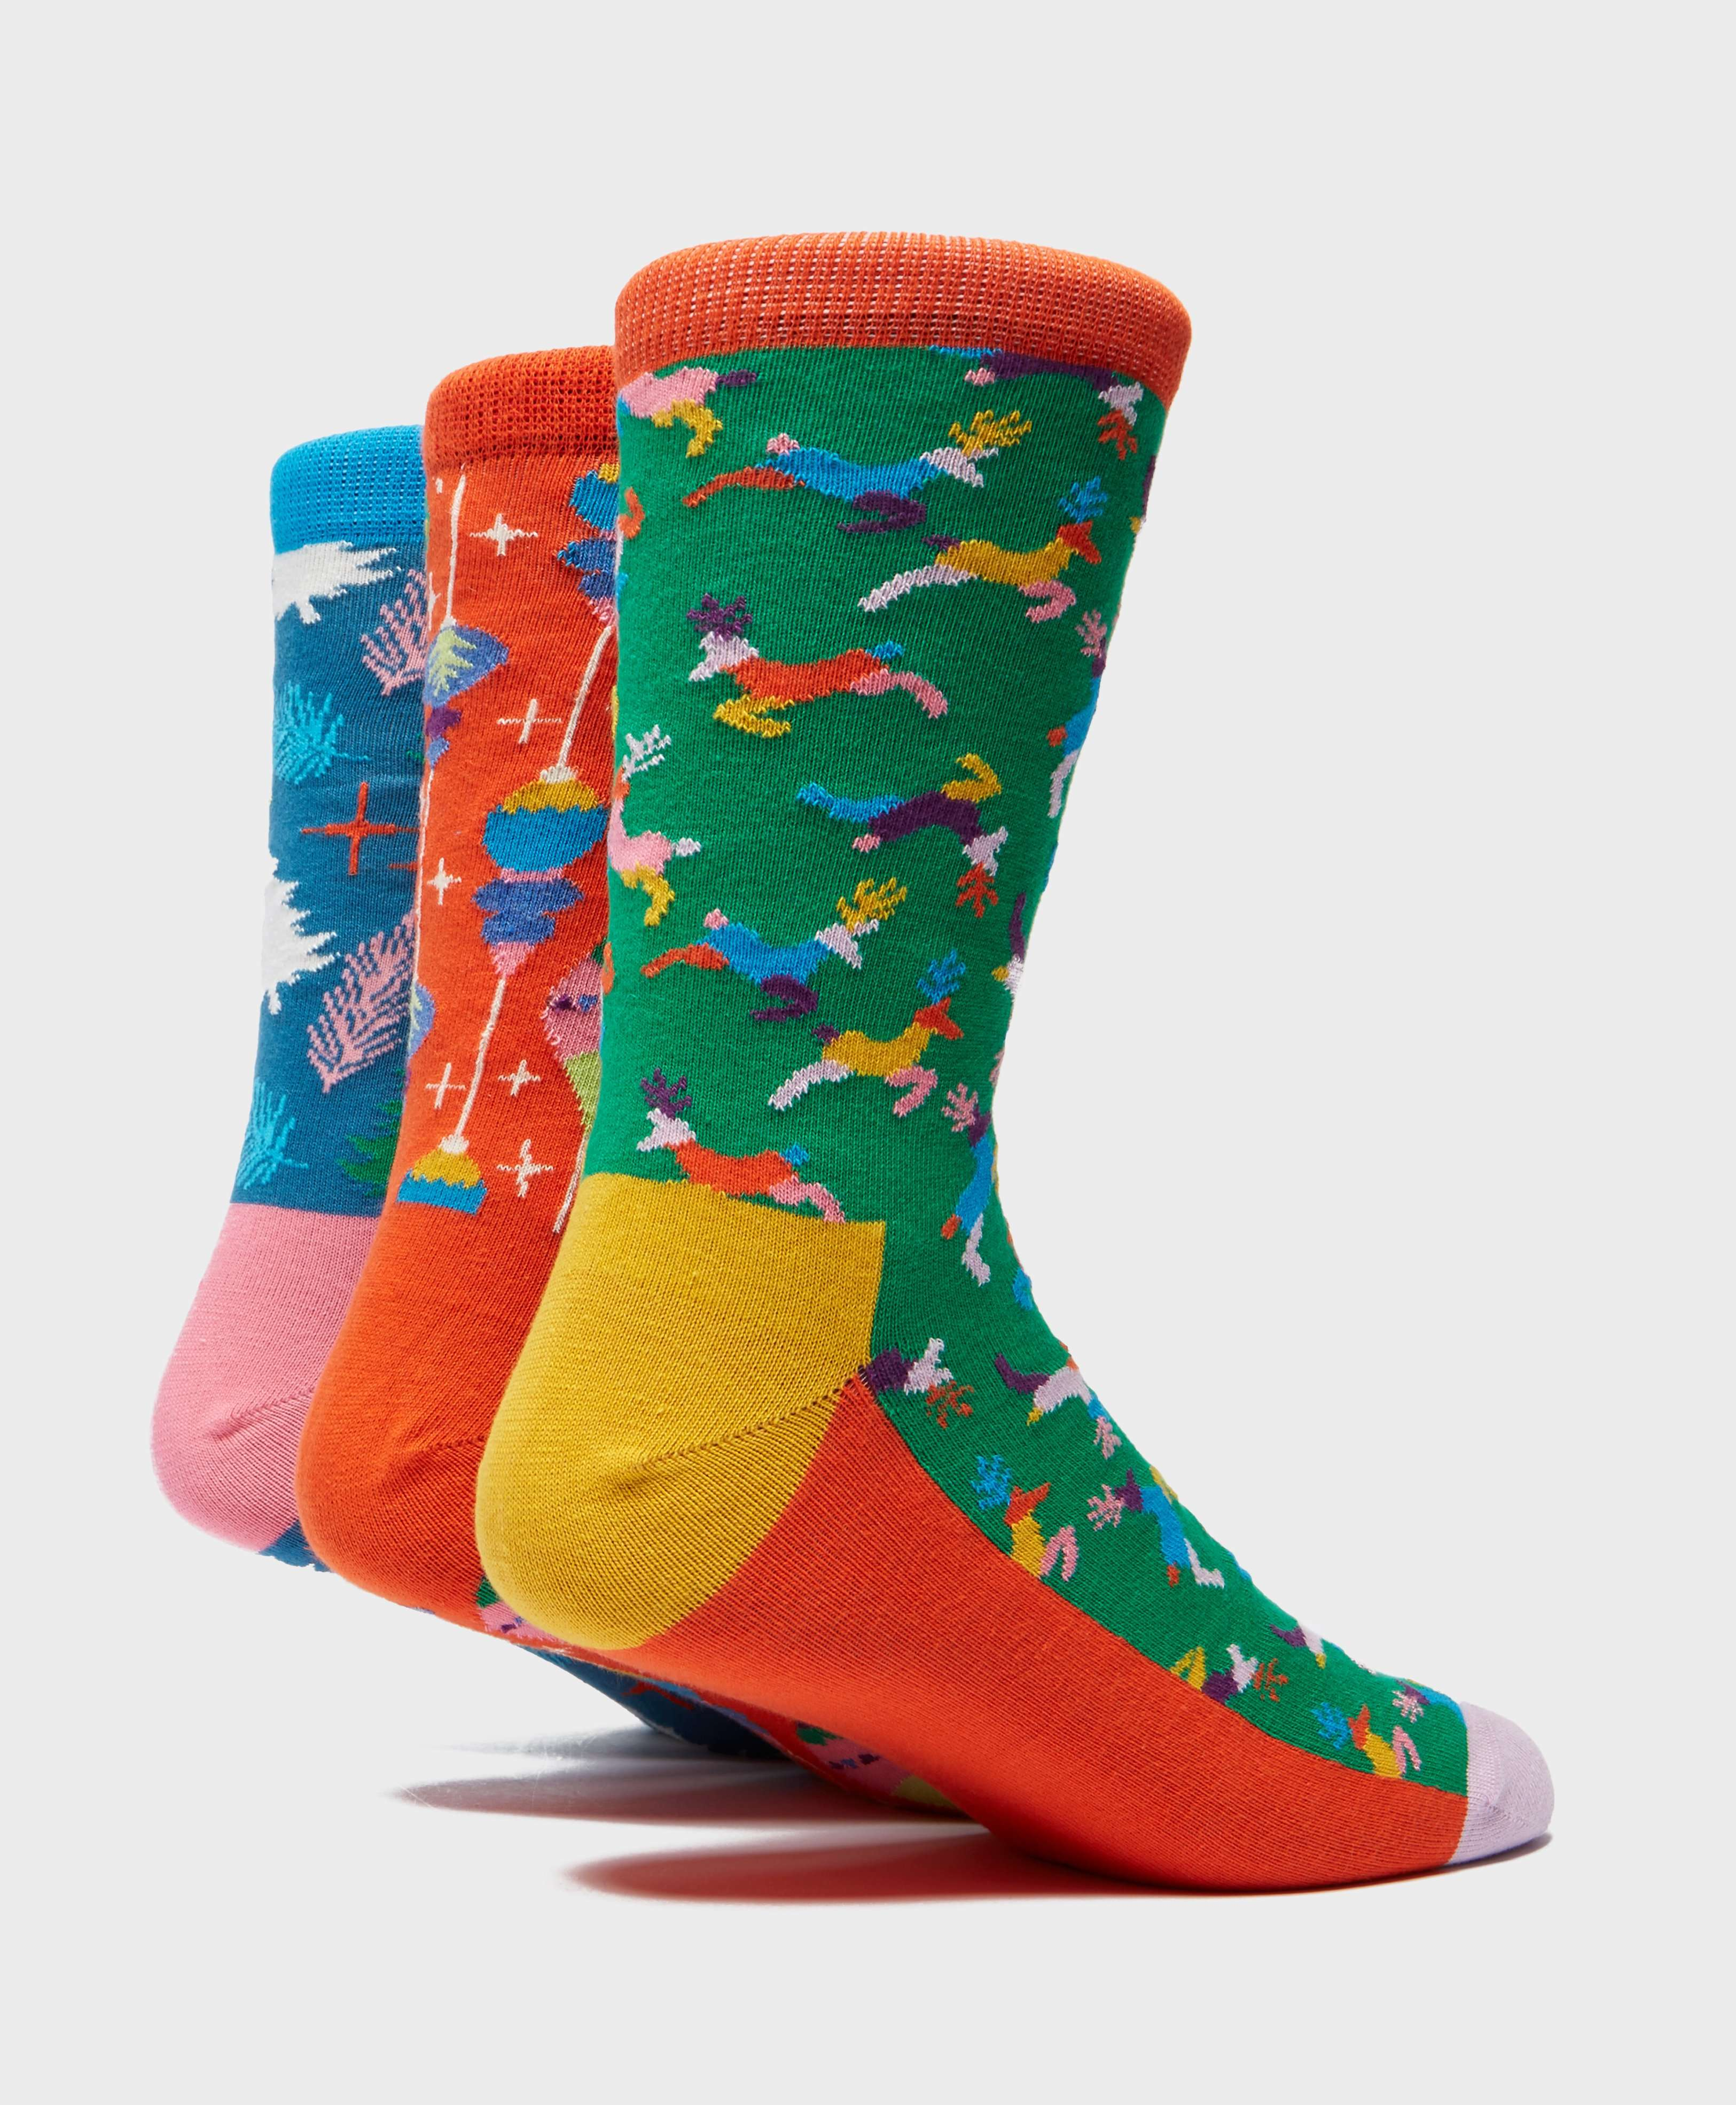 Happy Socks 3-Pack Christmas Music Box Socks